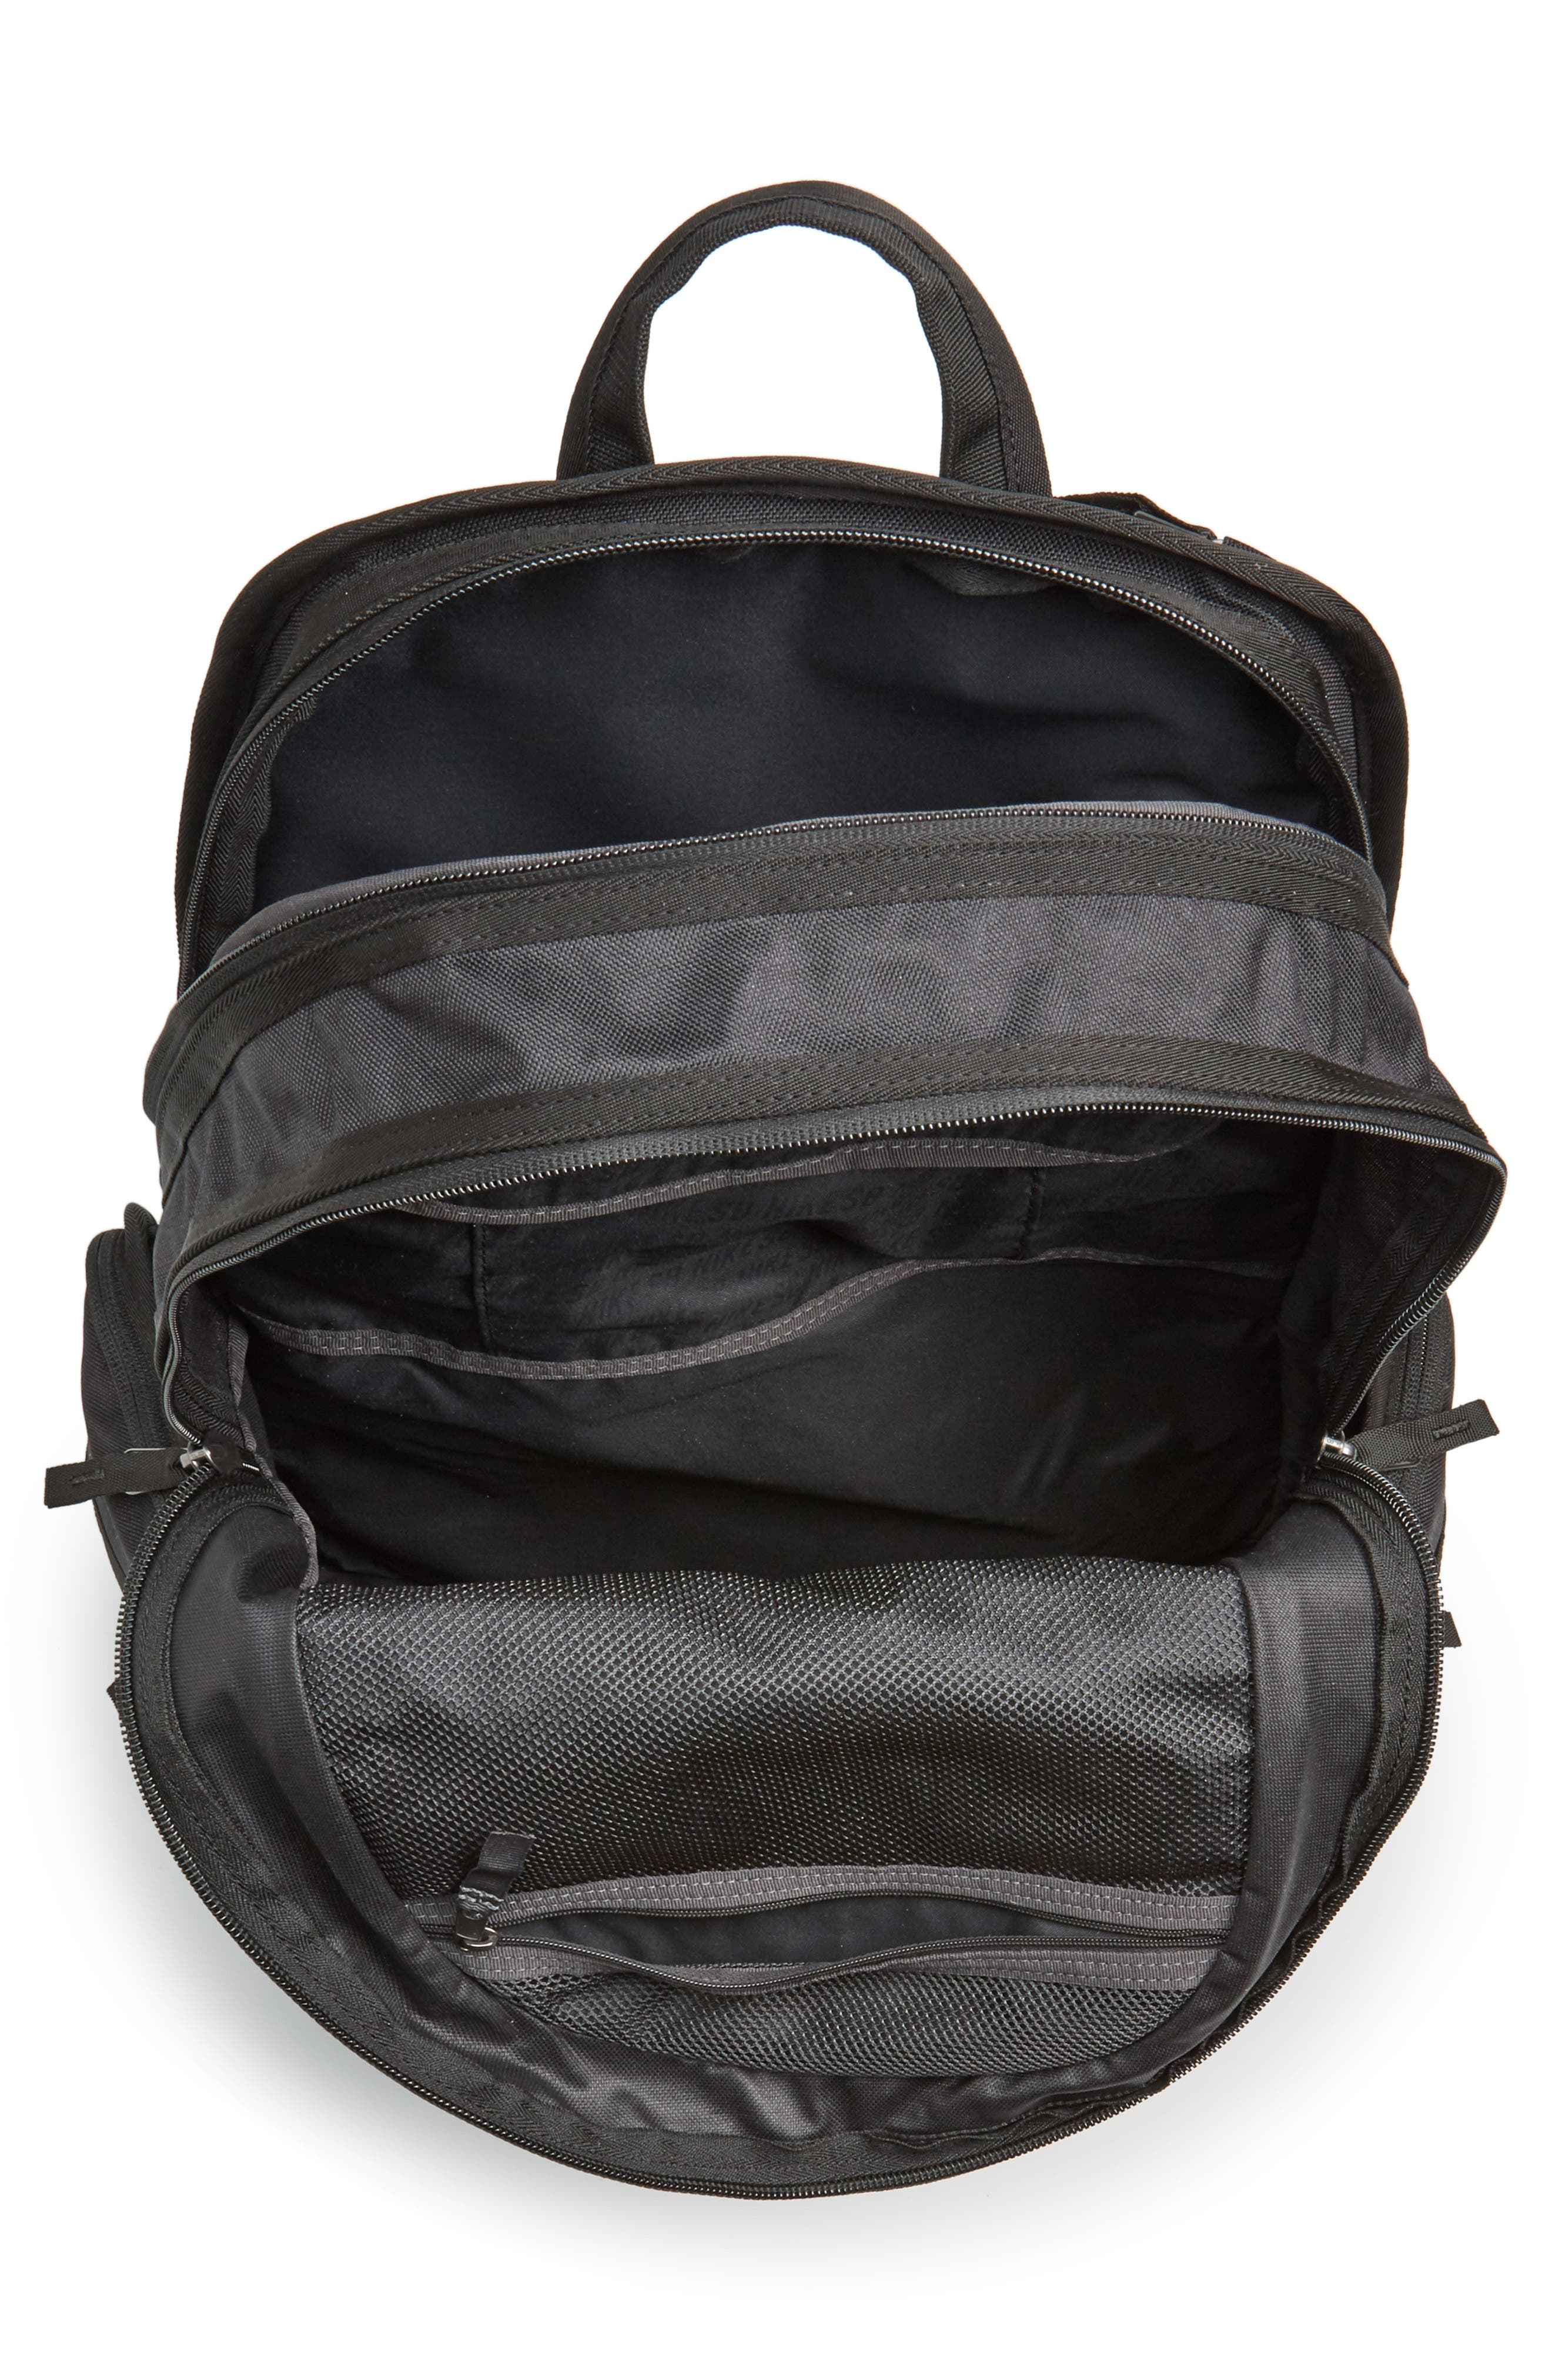 RPM Backpack,                             Alternate thumbnail 4, color,                             BLACK/ BLACK/ BLACK